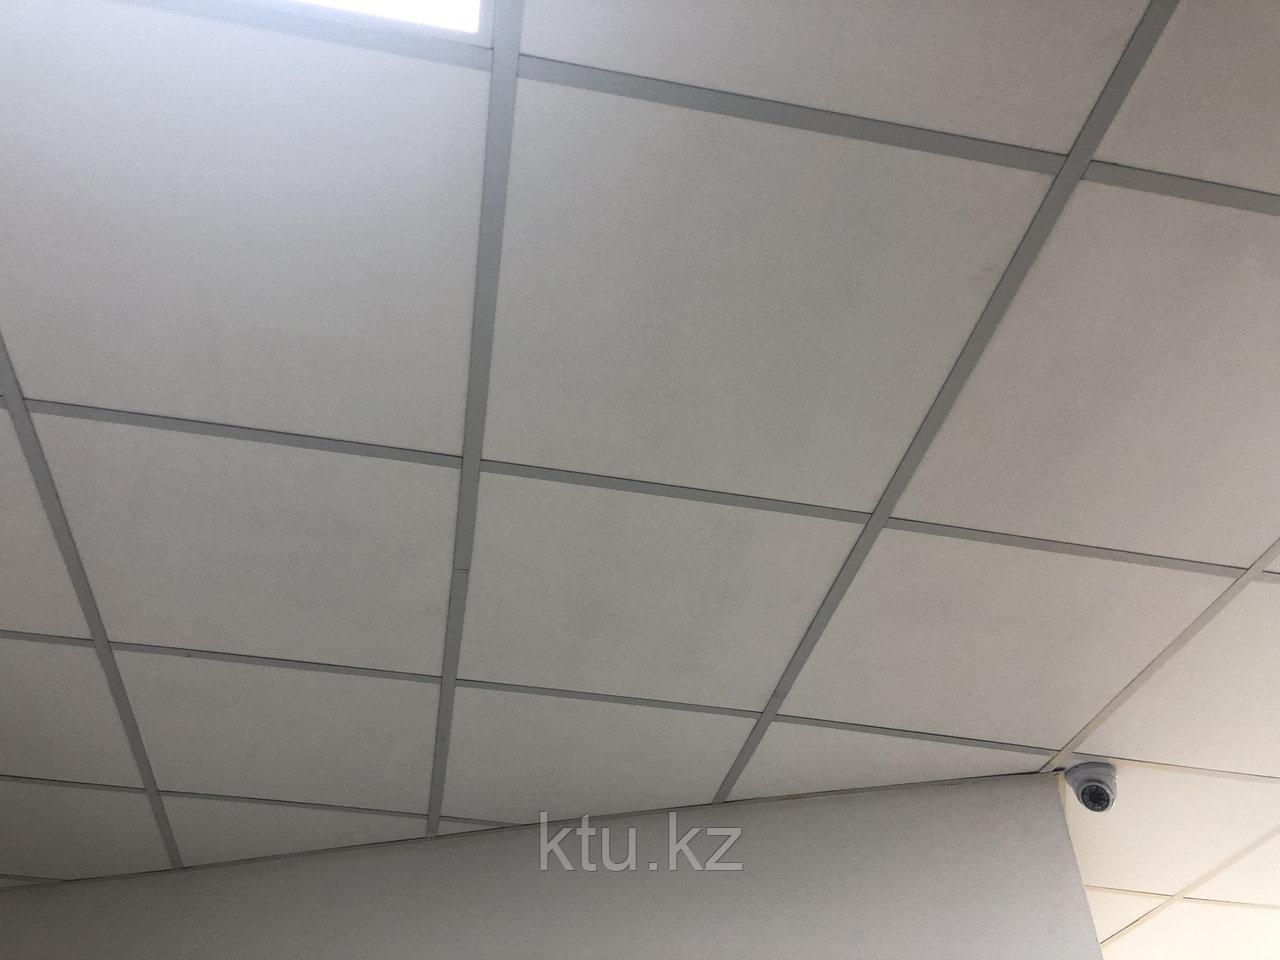 Подвесной потолок армстронг Retail Kazakhstan - фото 4